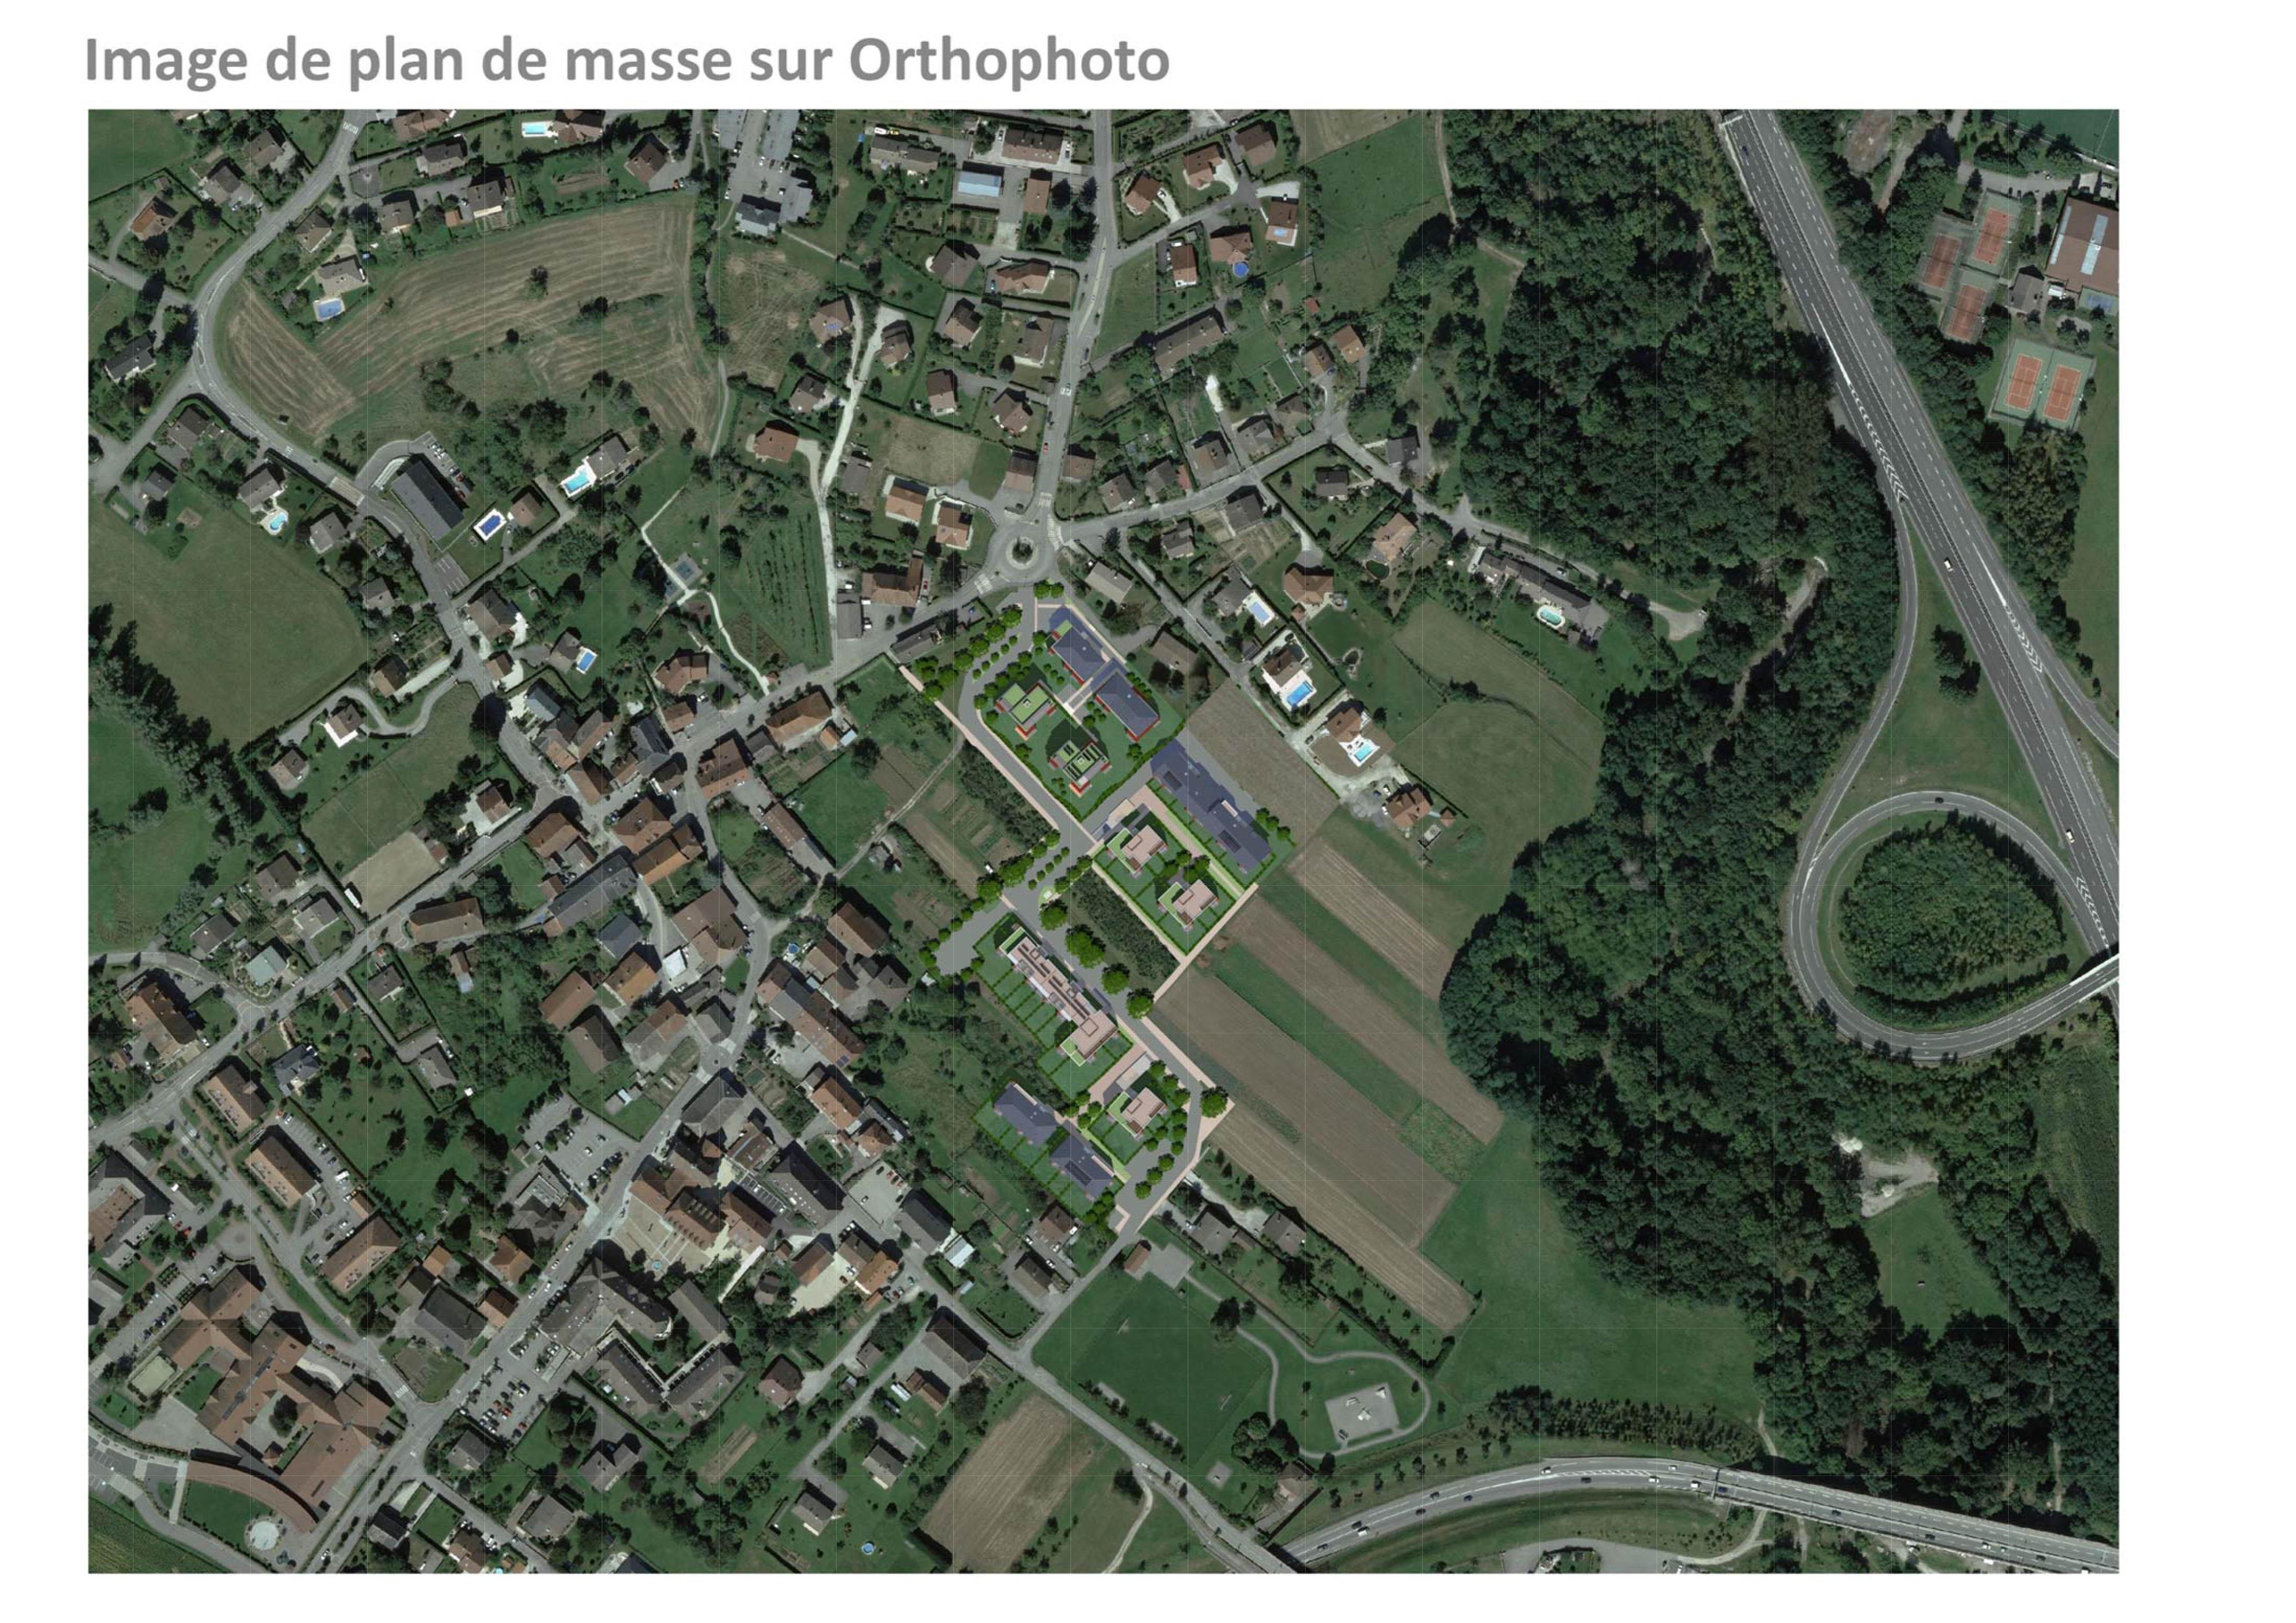 Coeur Village - Metz tessy